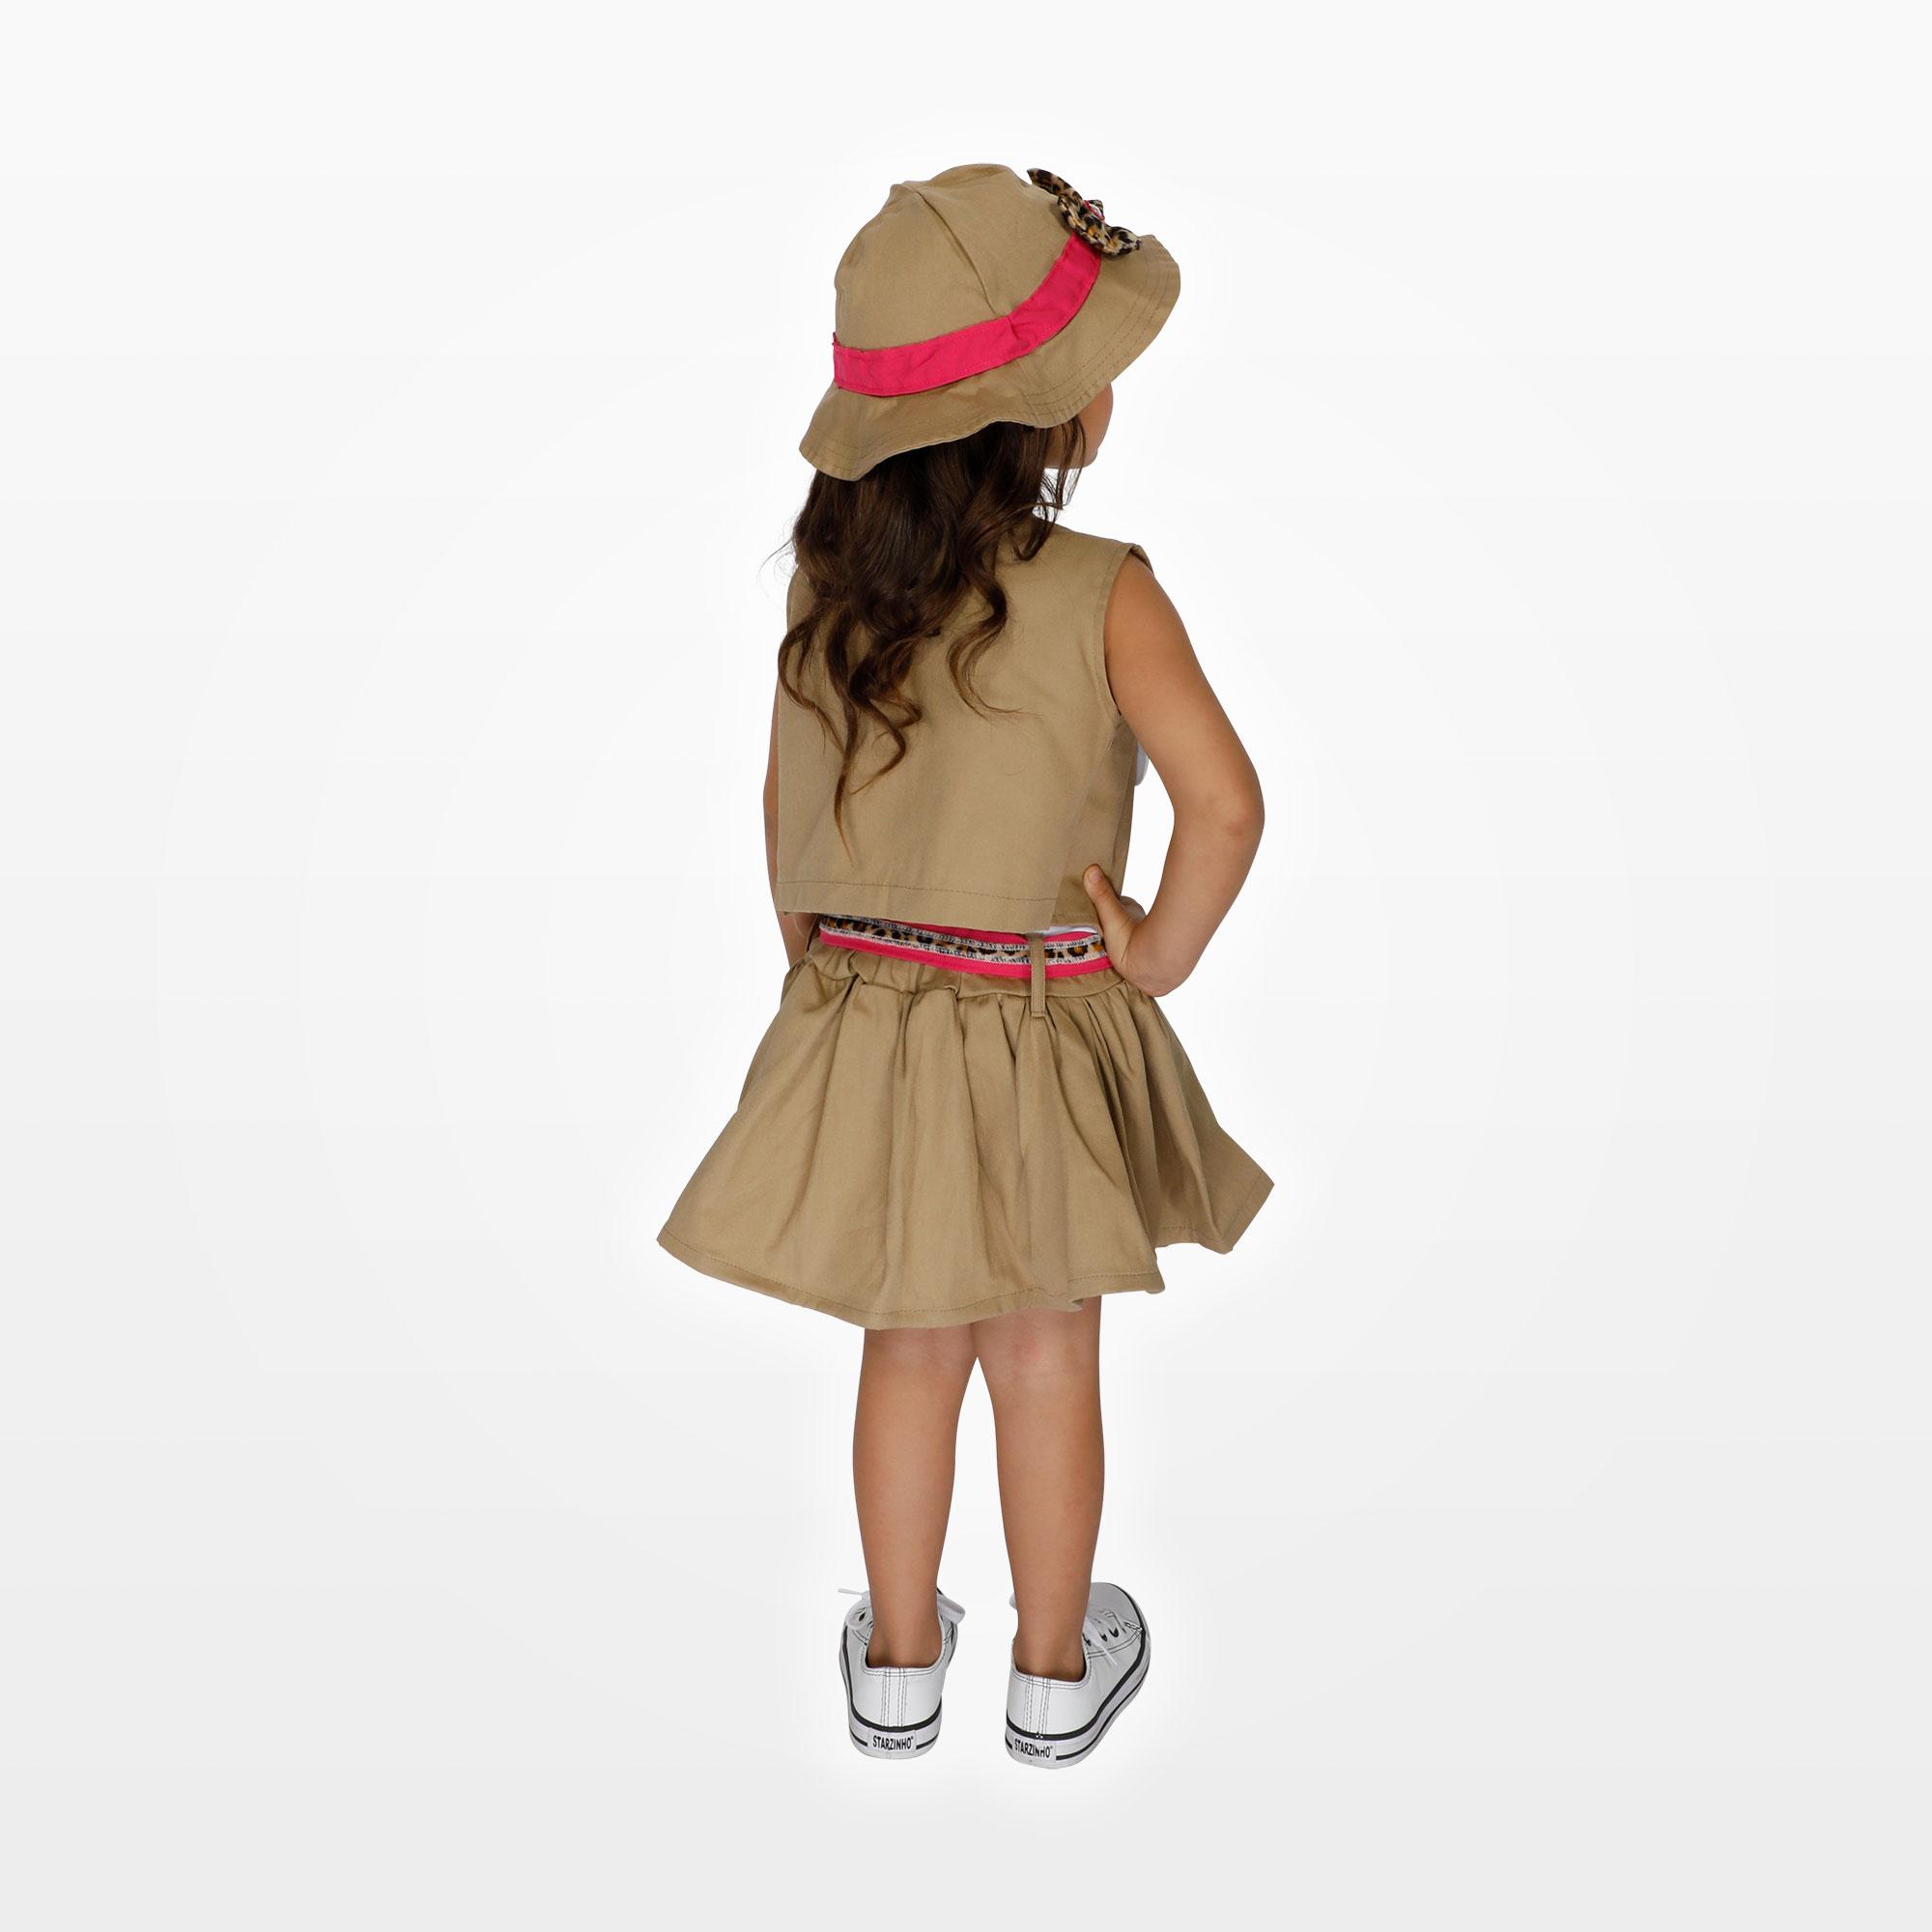 Fantasia Safári Feminino Infantil